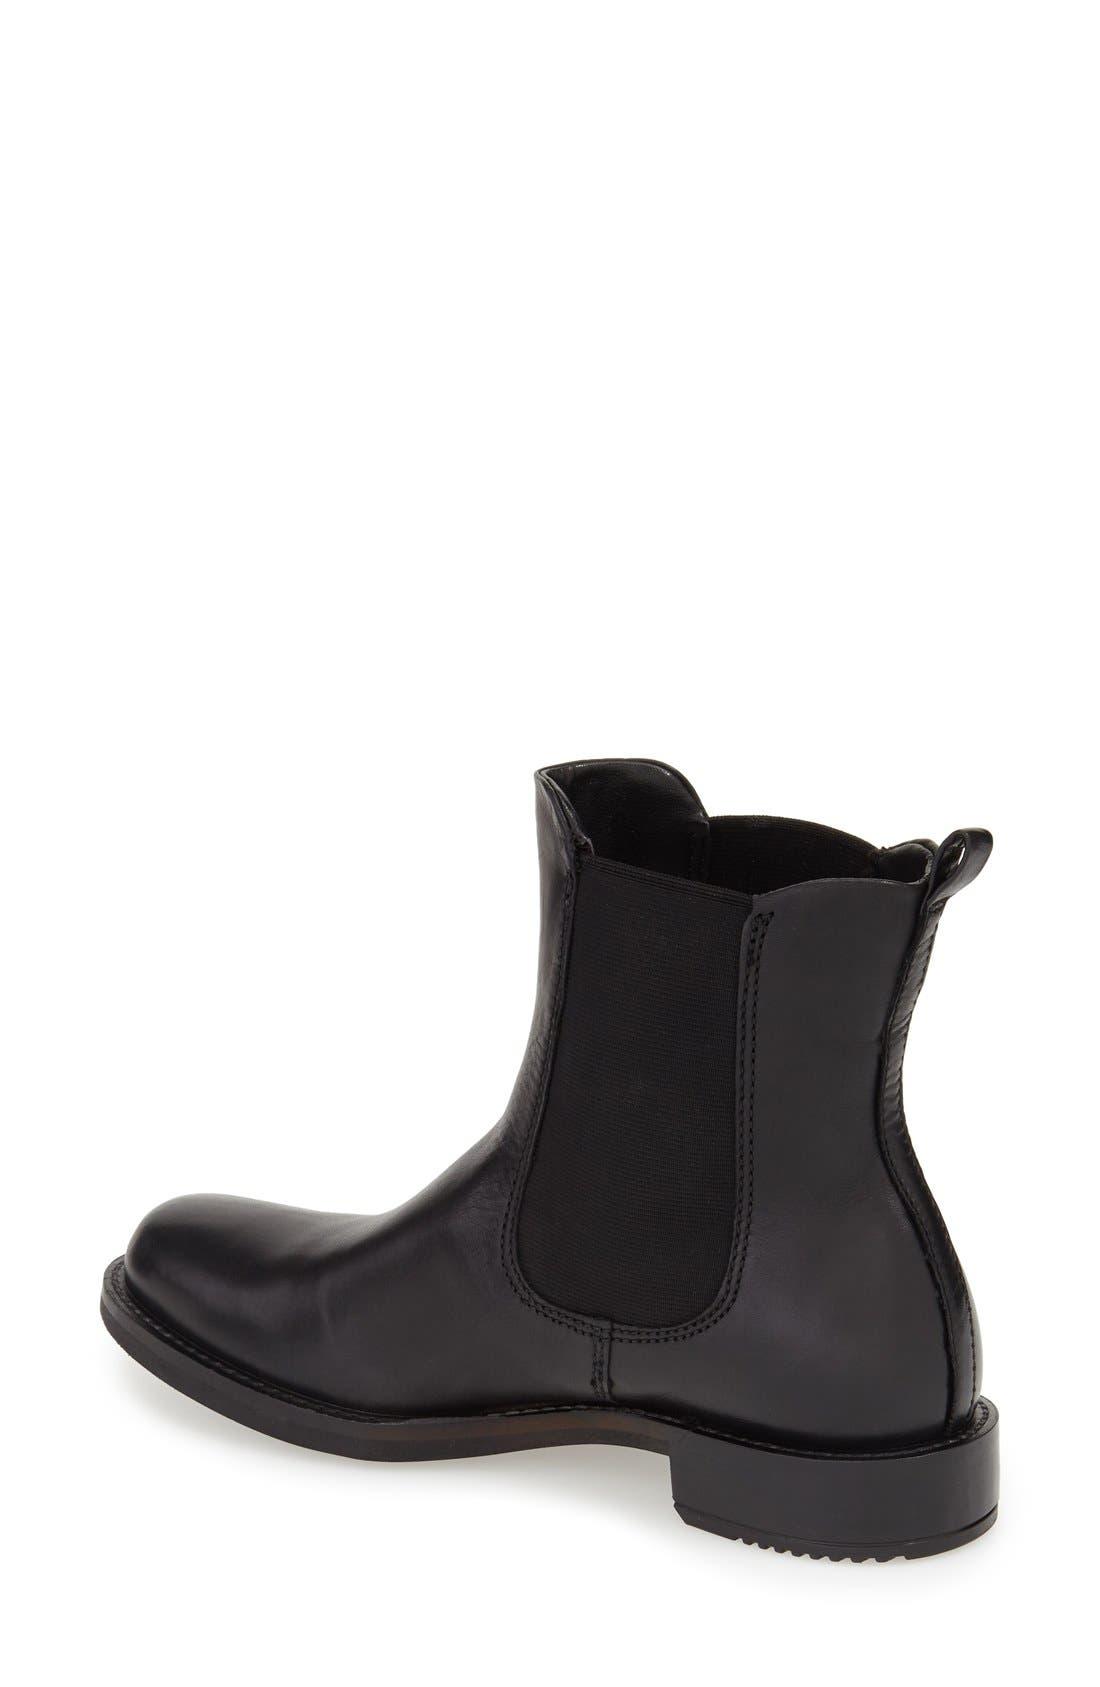 'Shape 25' Chelsea Boot,                             Alternate thumbnail 2, color,                             Black Leather